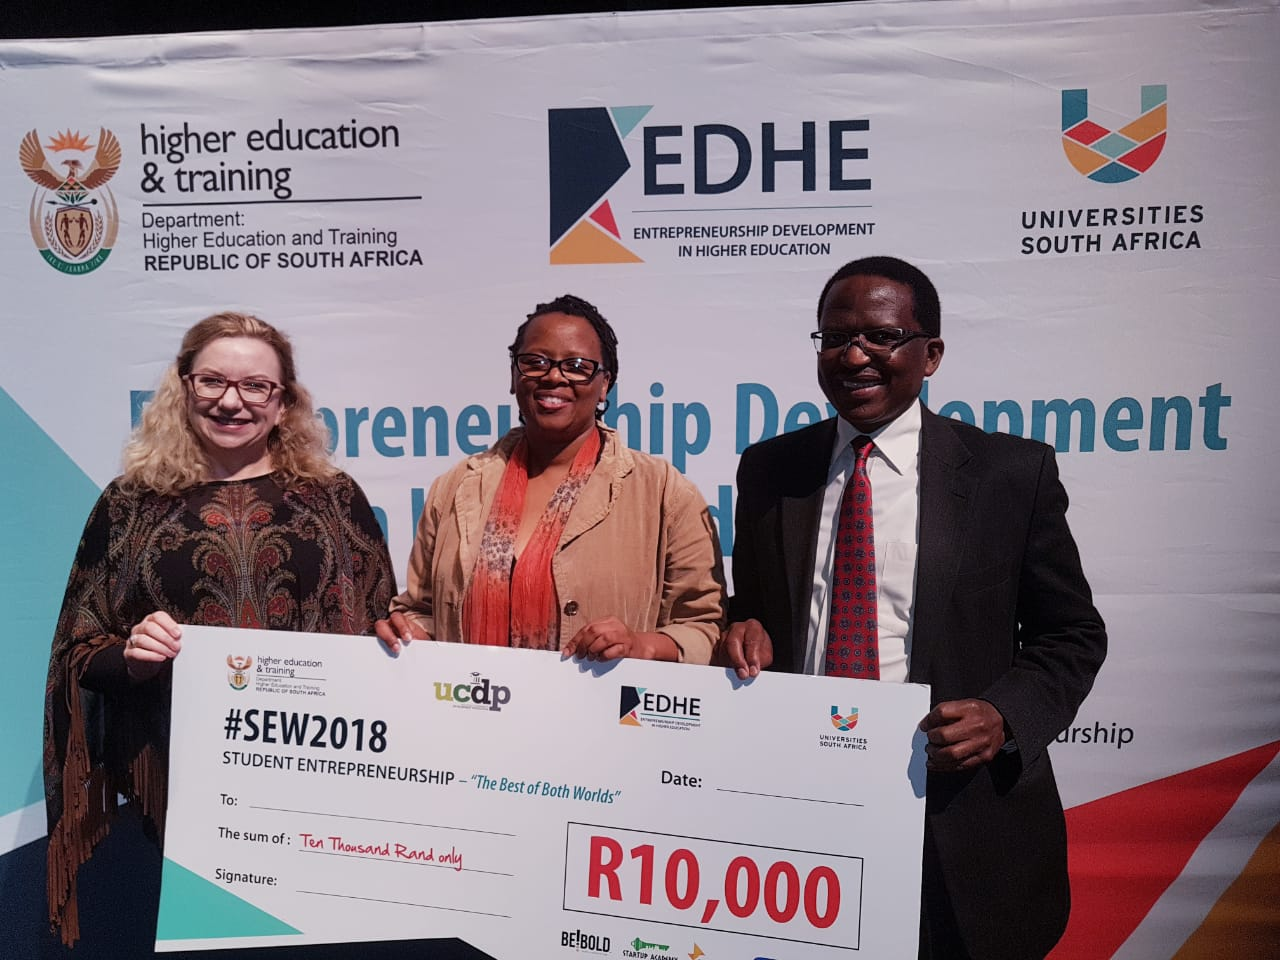 From left to right: Dr Norah Clarke (Director: Entrepreneurship, Universities South Africa), Dr Tshidi Mohapeloa (Senior Lecturer: Rhodes Business School) and Dr Sizwe Mabizela (Vice-Chancellor: Rhodes University) #SEW2018 @EDHE Student Entrepreneurship — at Rhodes University.